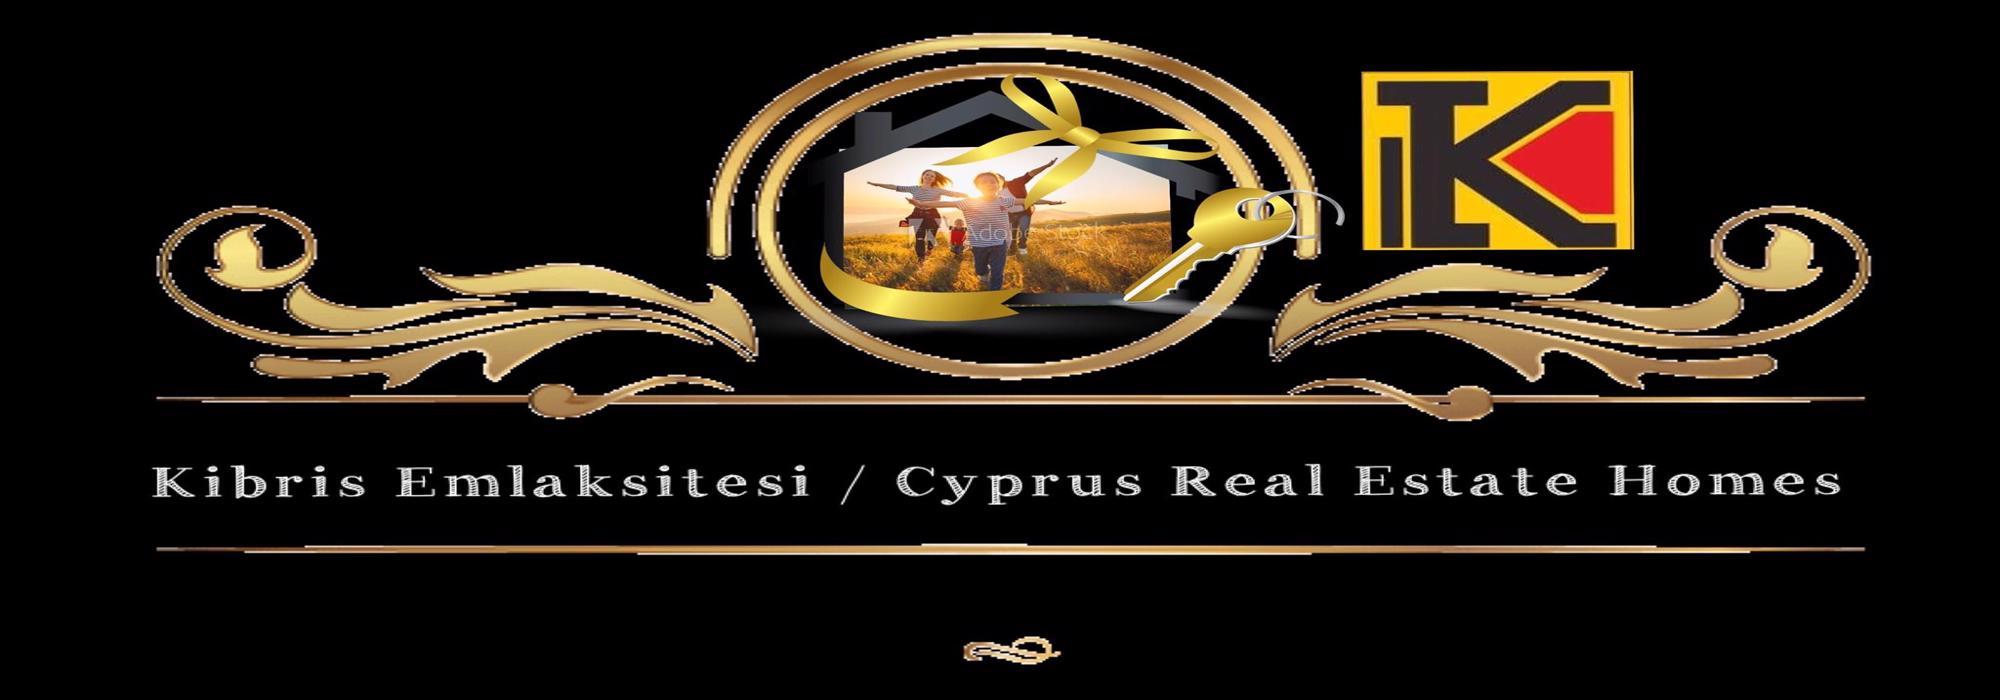 Cyprus Real Estate Homes